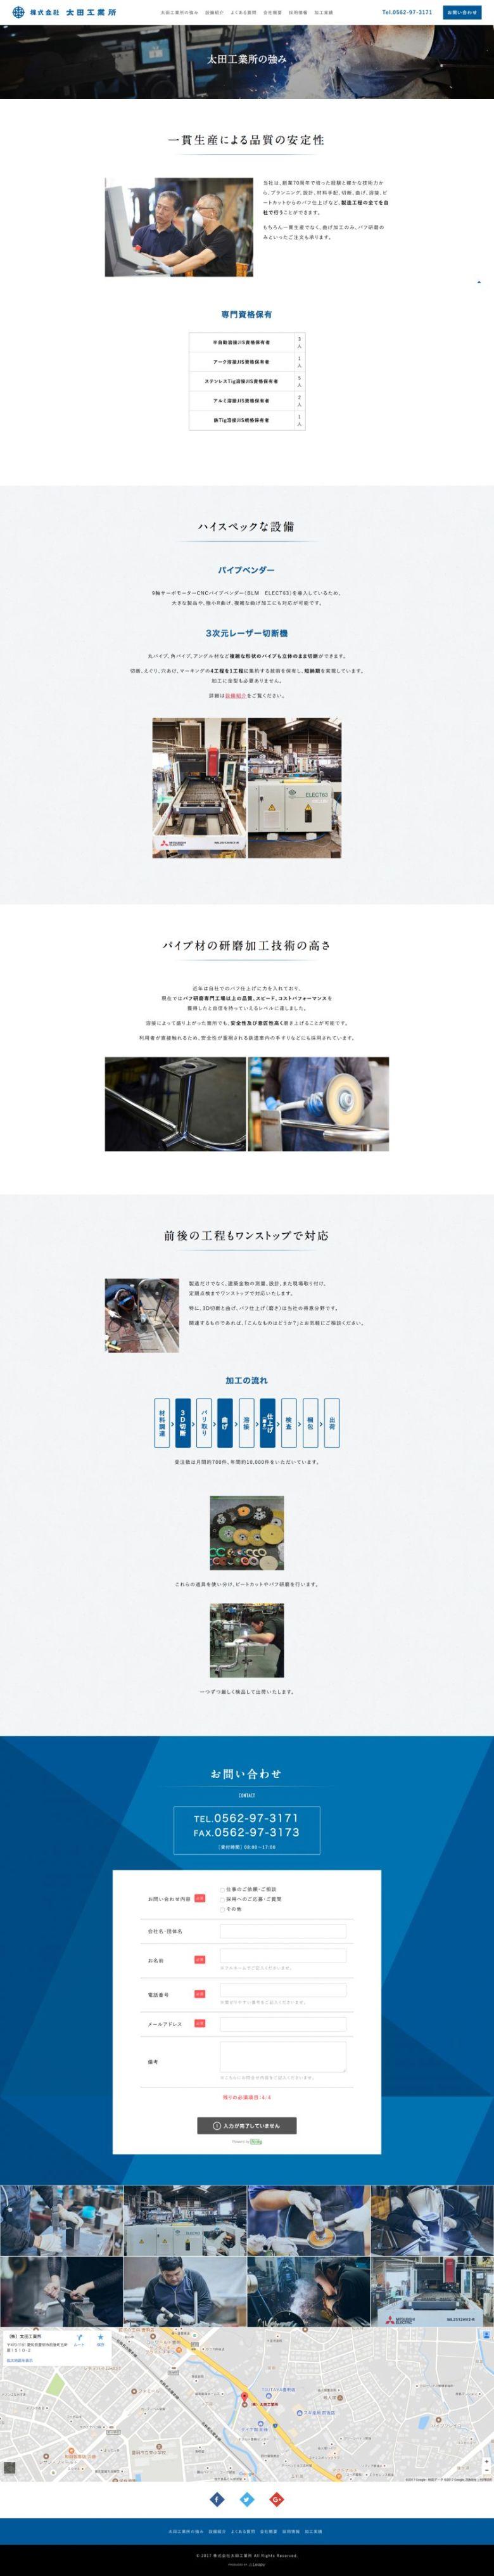 otakougyou_kasou-840x4378